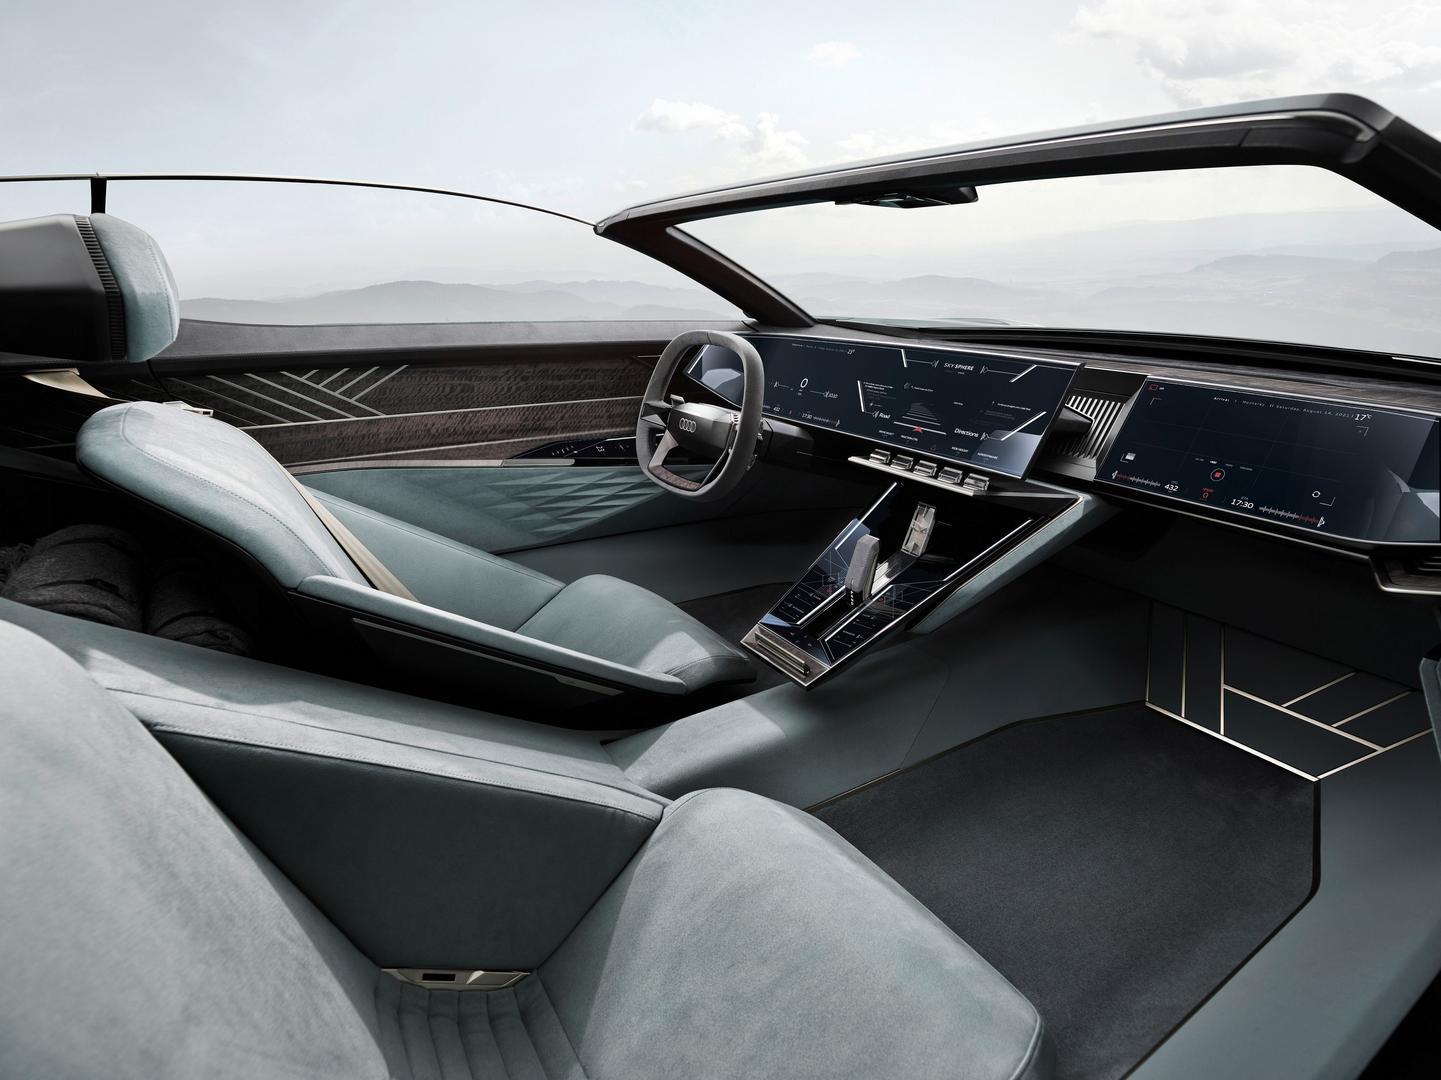 Audi skysphere cabin